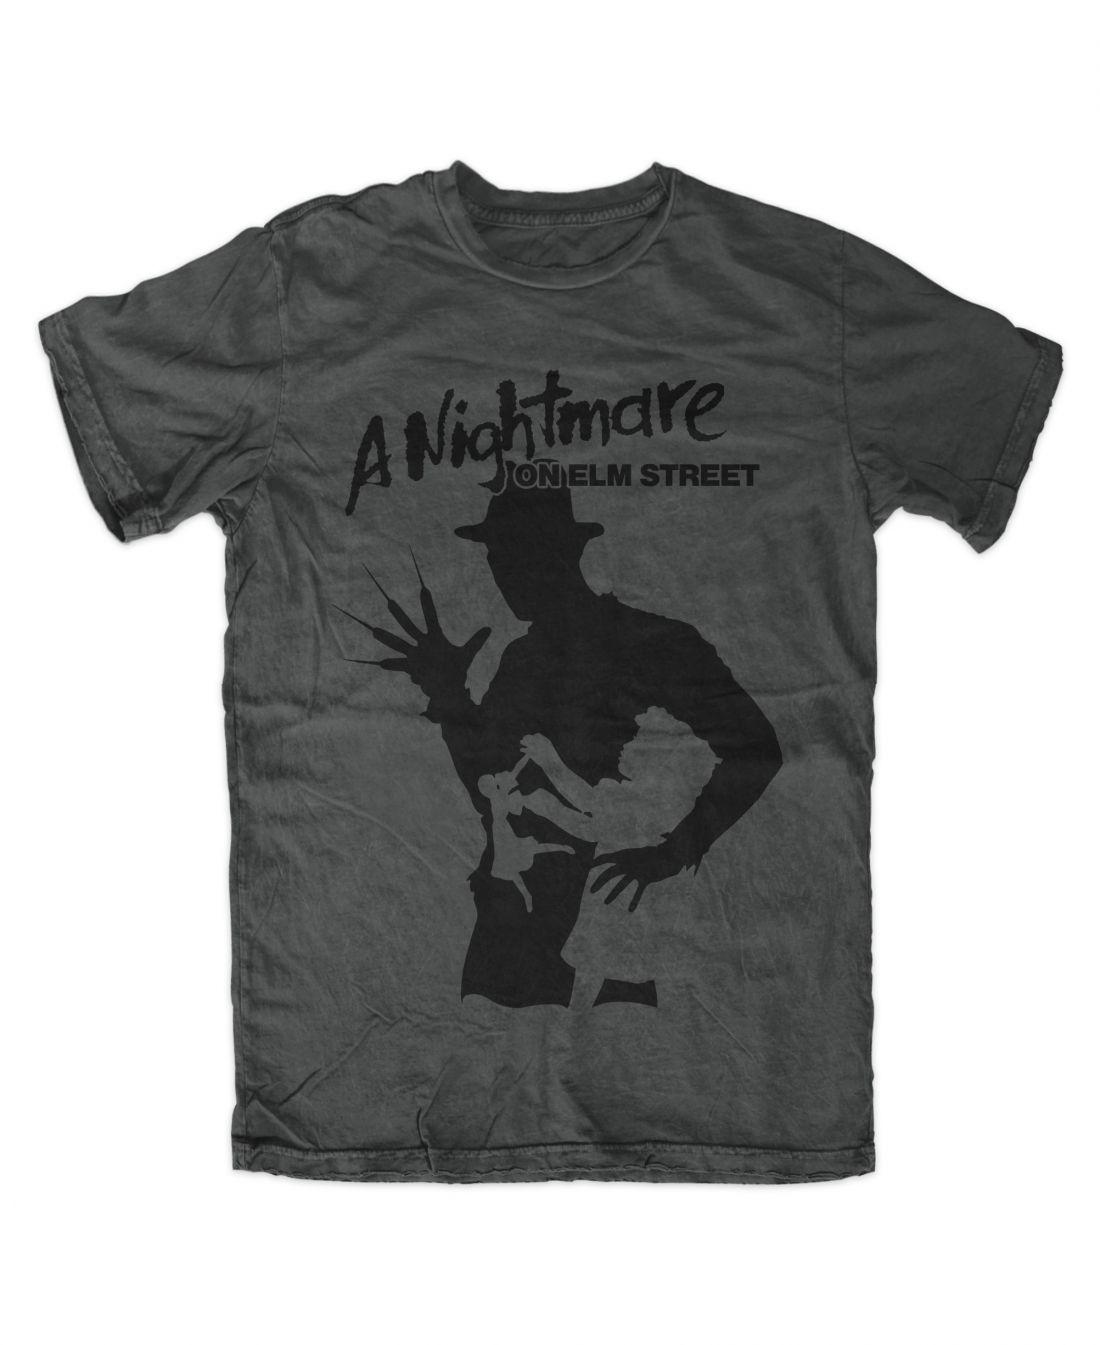 A Nightmare On Elm Street 001 (charcoal póló)